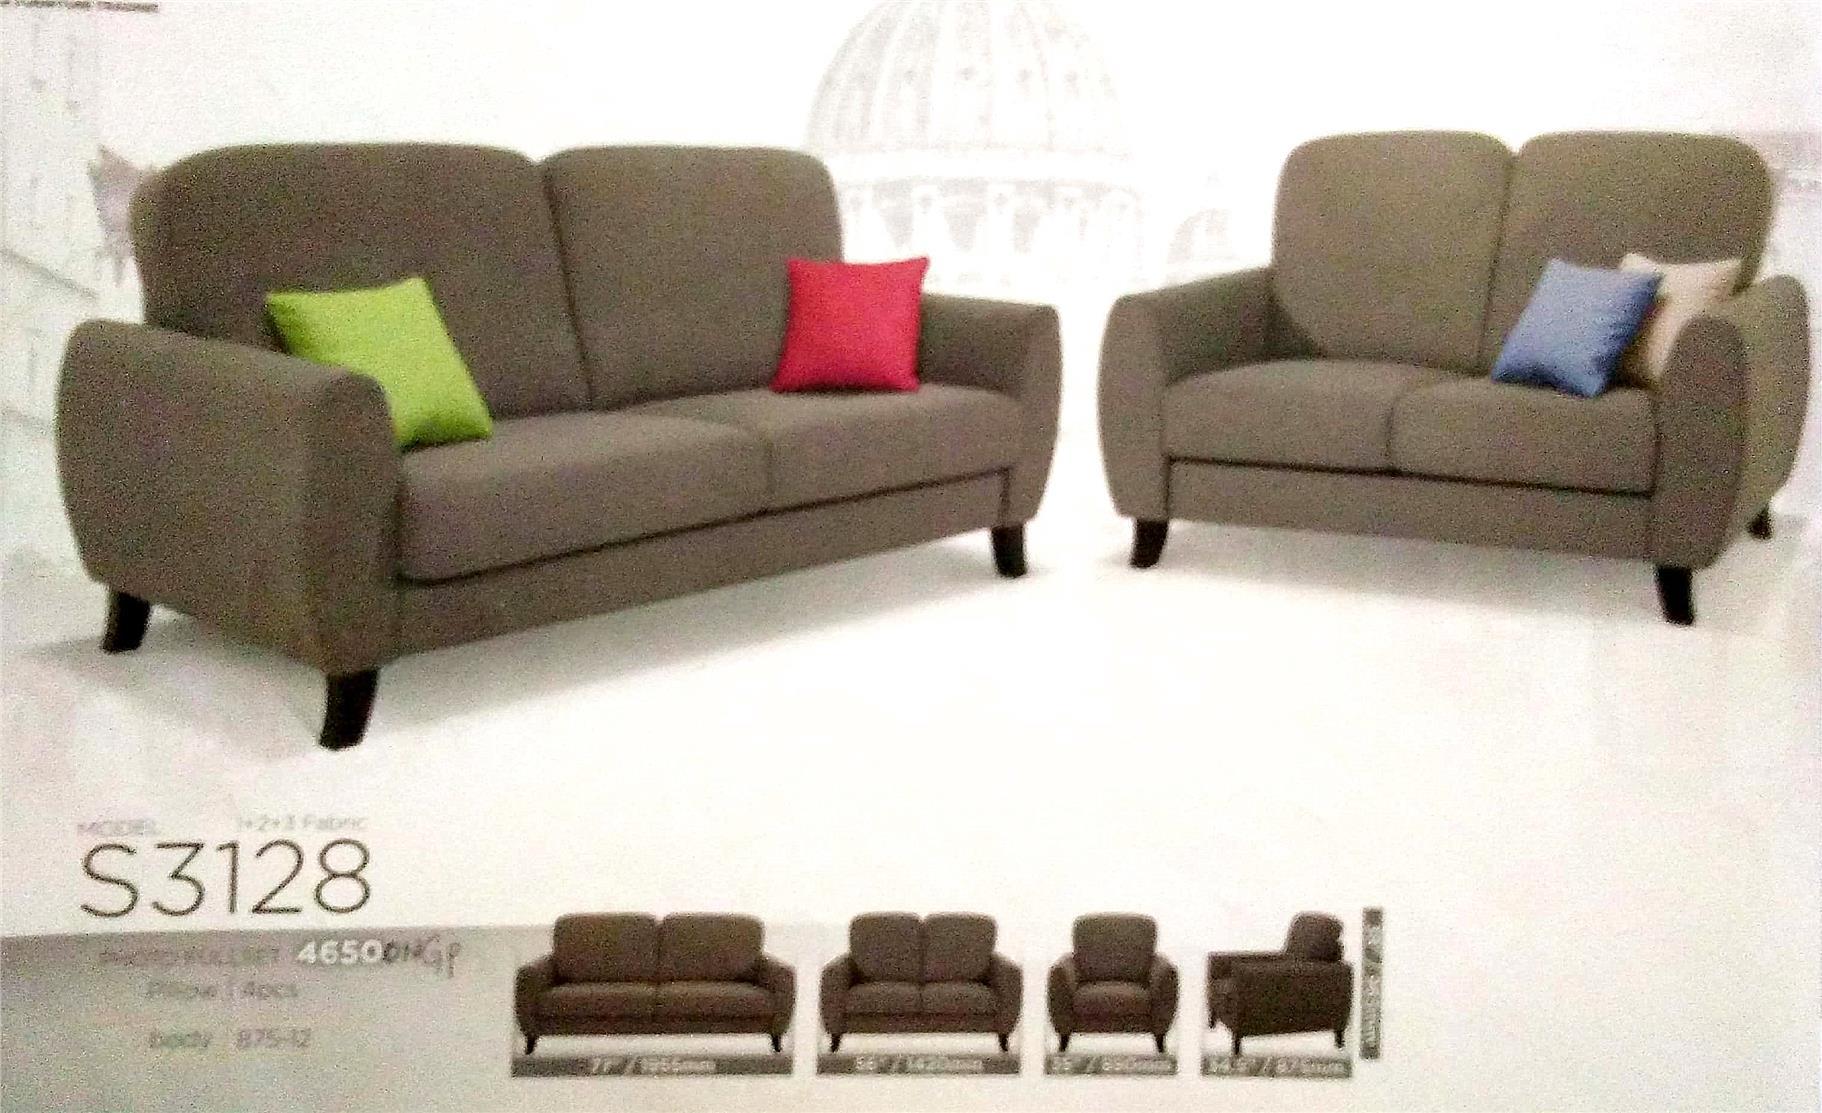 Installment Plan Sofa Set 3 2 1 3 End 12 23 2018 2 15 Pm